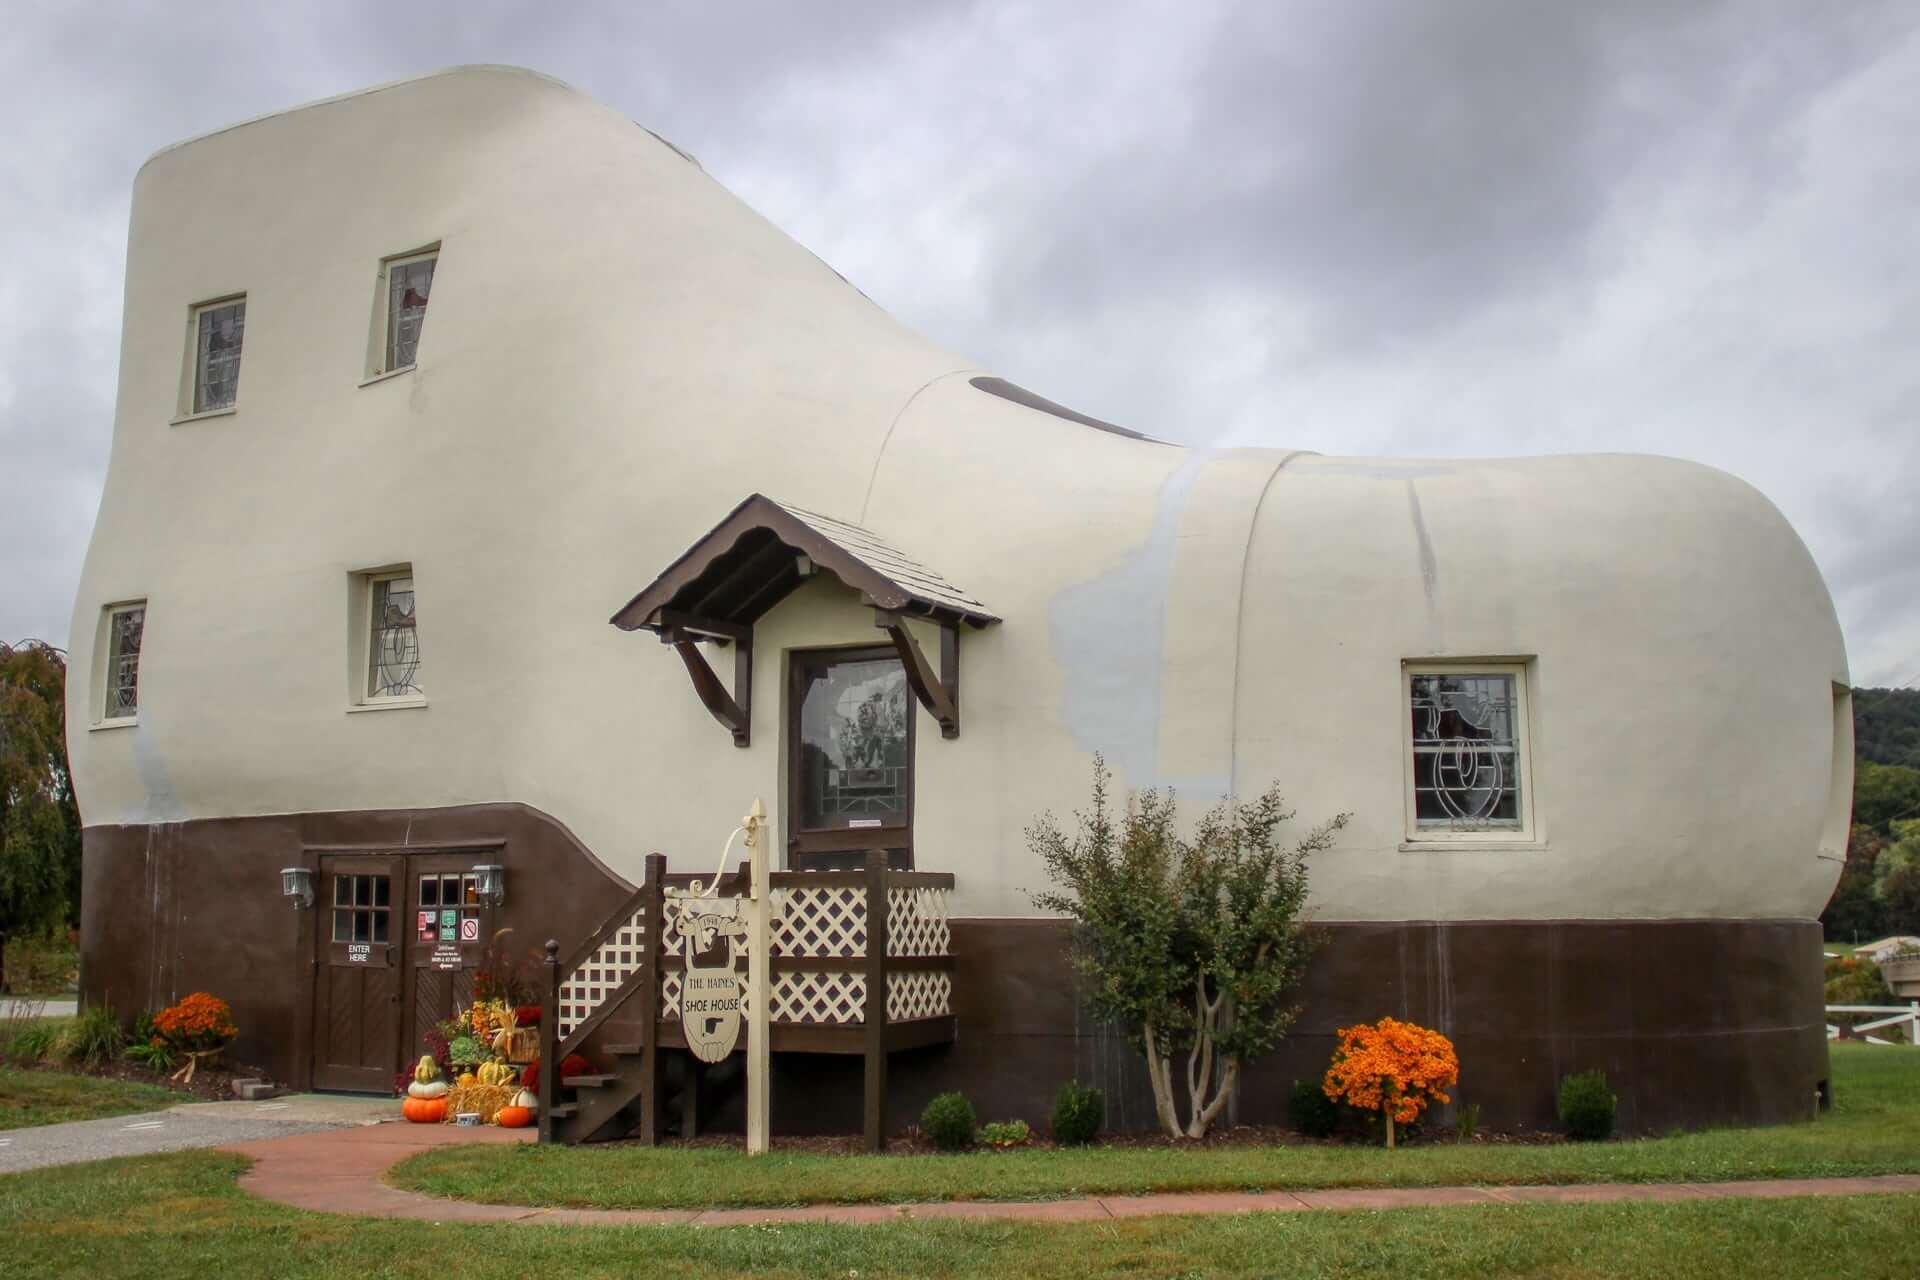 The Shoe House